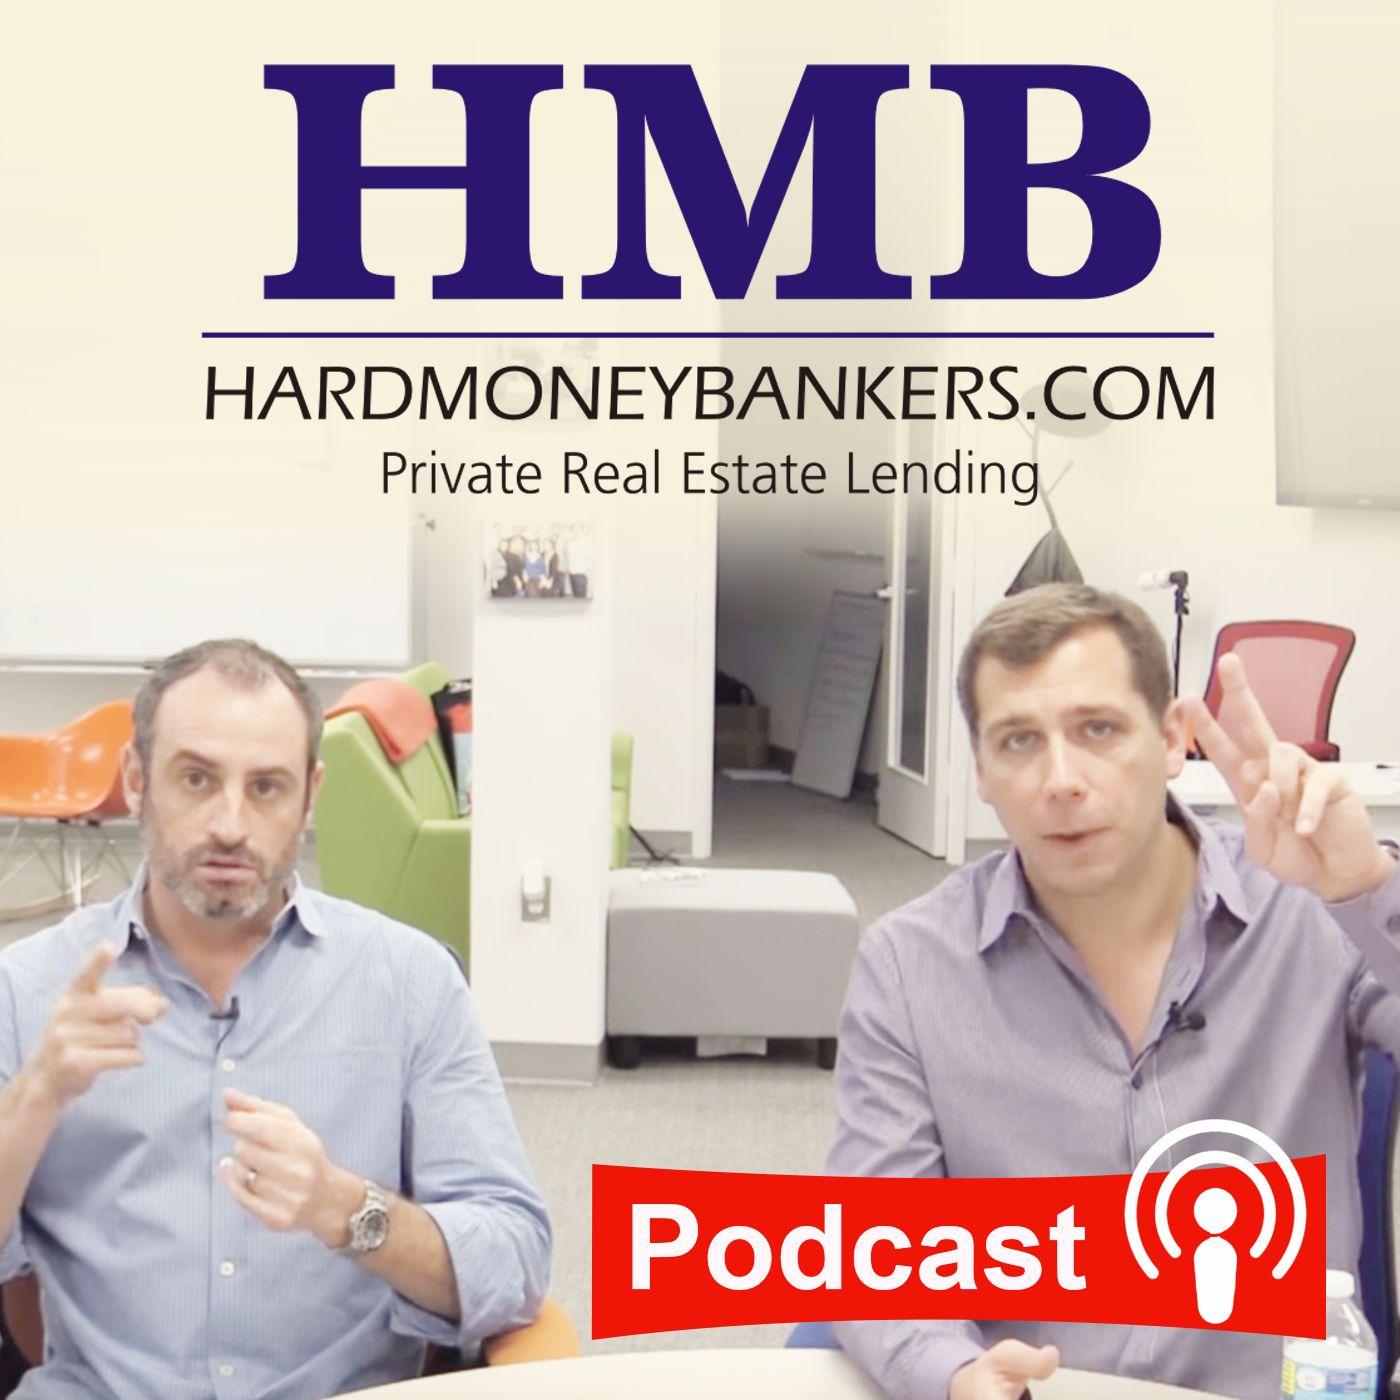 Hard Money Bankers